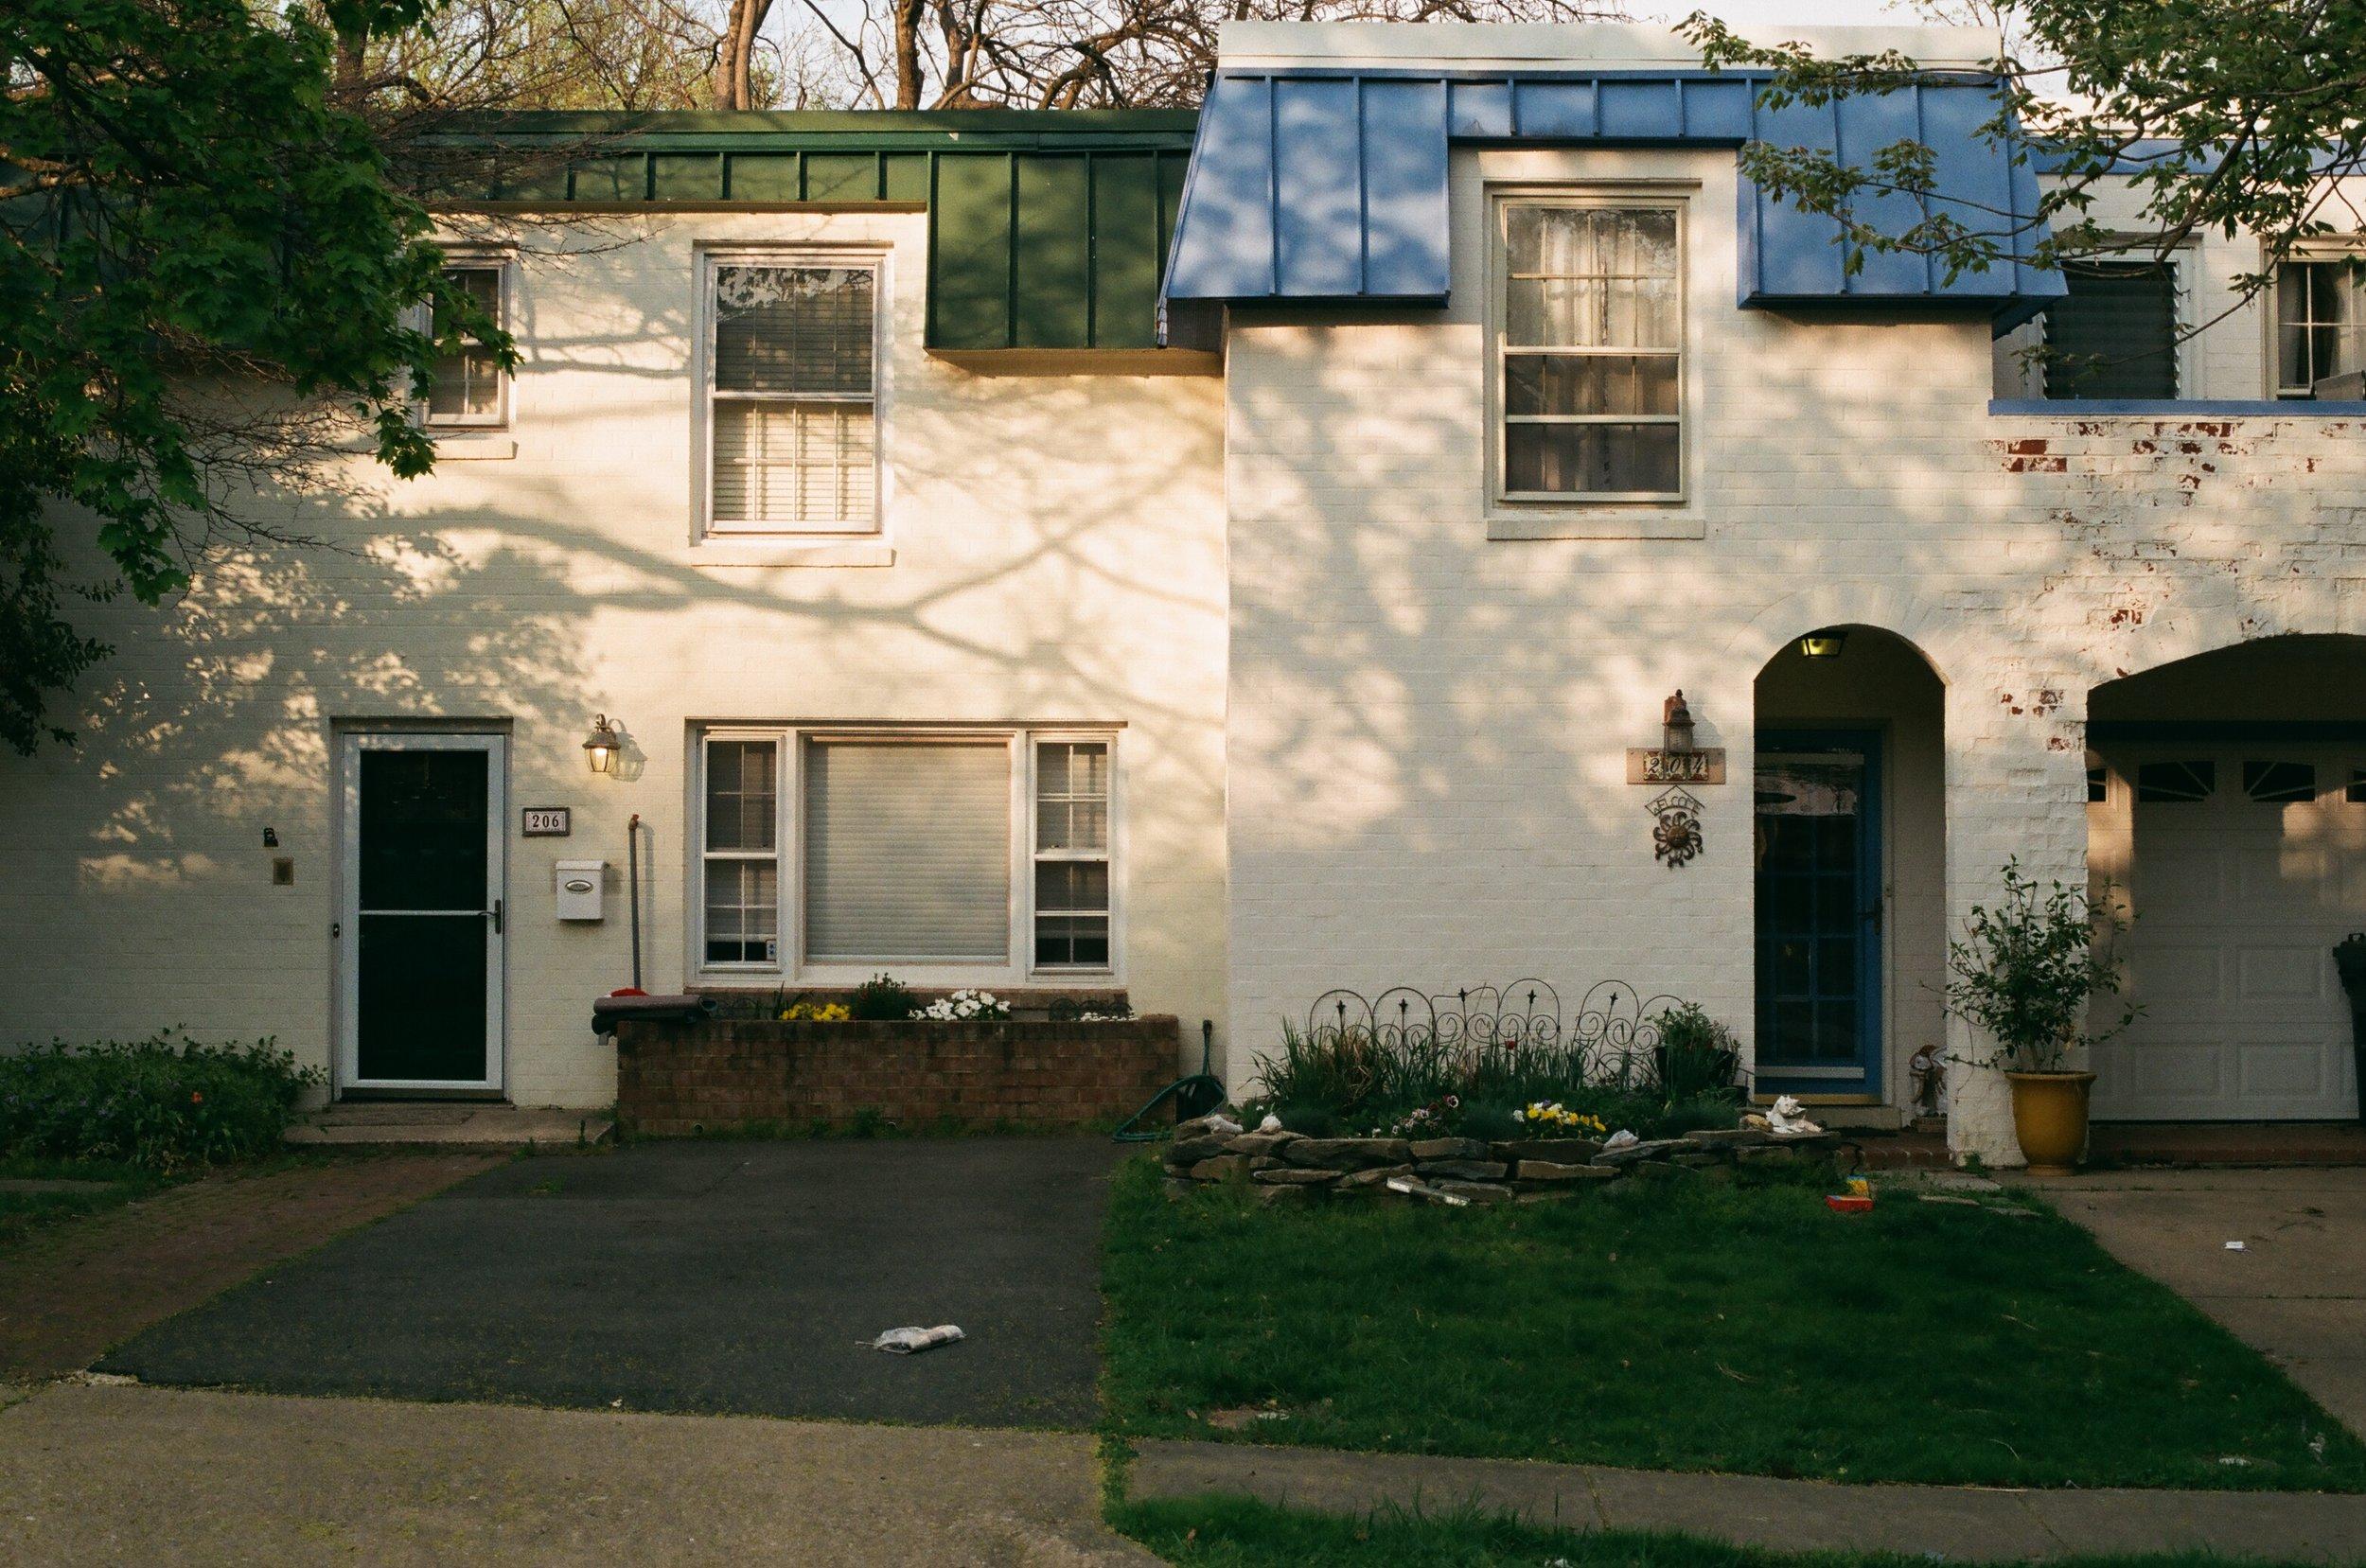 northern virginia houses_tealmagazine_35mm